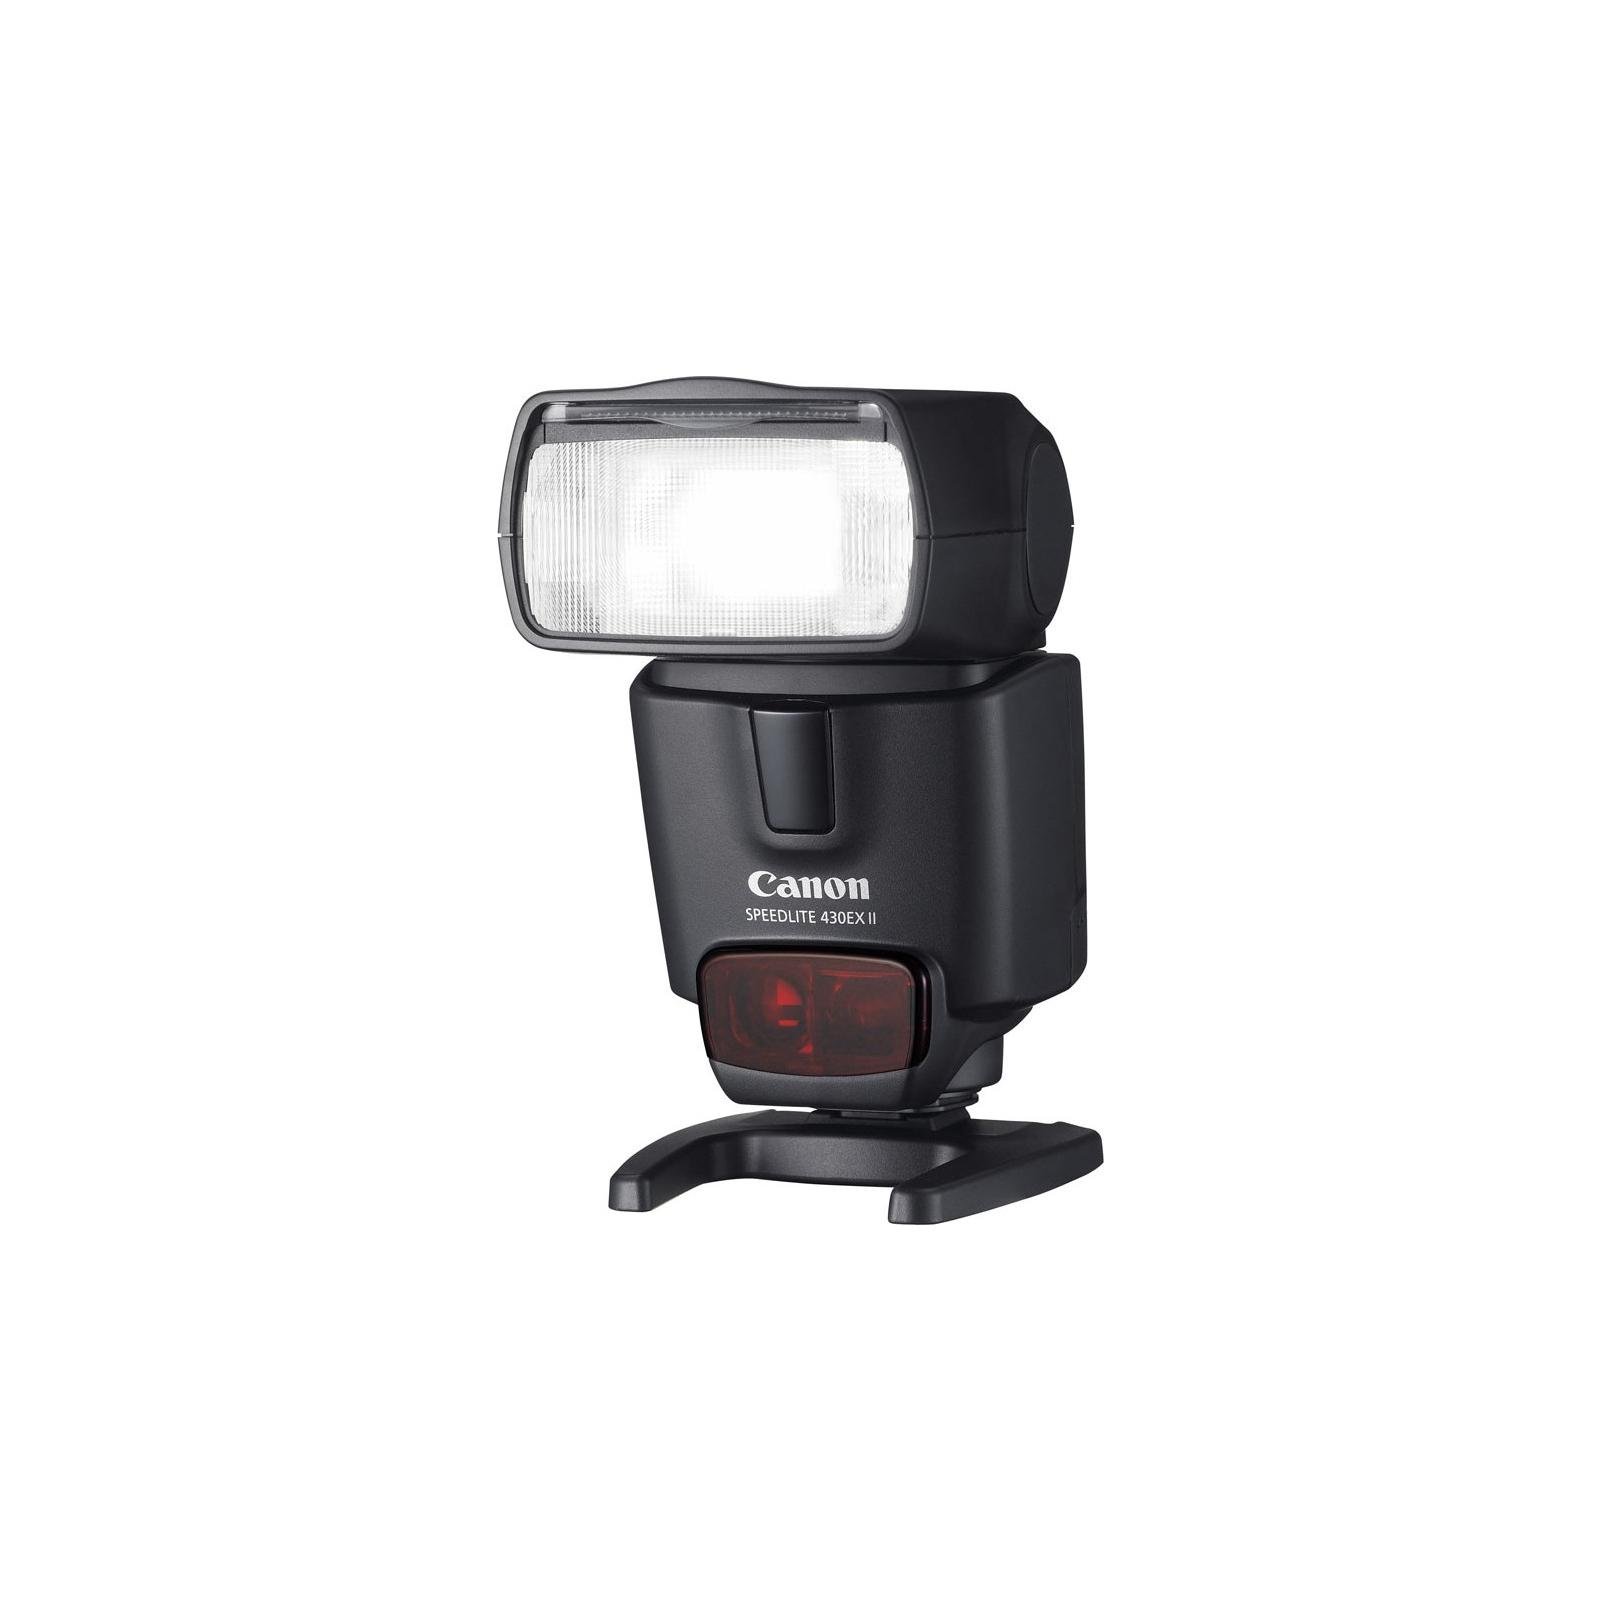 Вспышка Speedlite 430EX II Canon (2805B003/2805B015/2805B015AA)